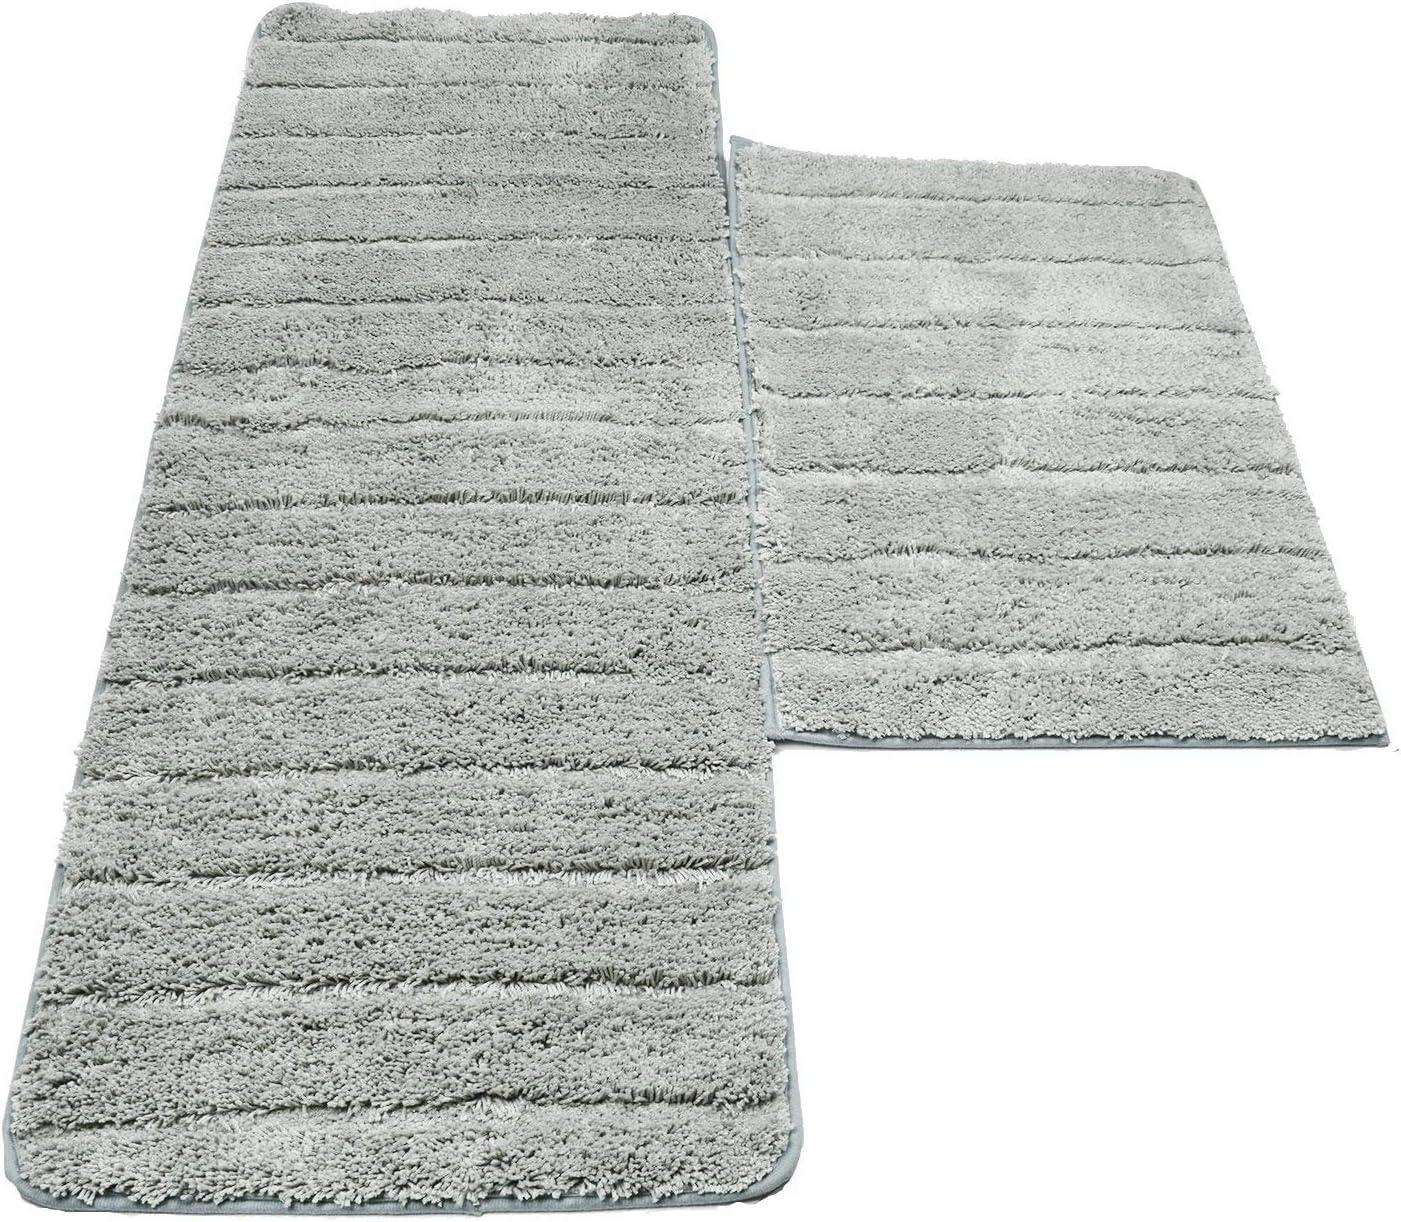 Grey Homcomodar Microfiber Bath Rugs for Bathroom Set 2 Piece Absorbent Soft Polyester Non-slip Floor Runner Rugs Washable Bath Mats